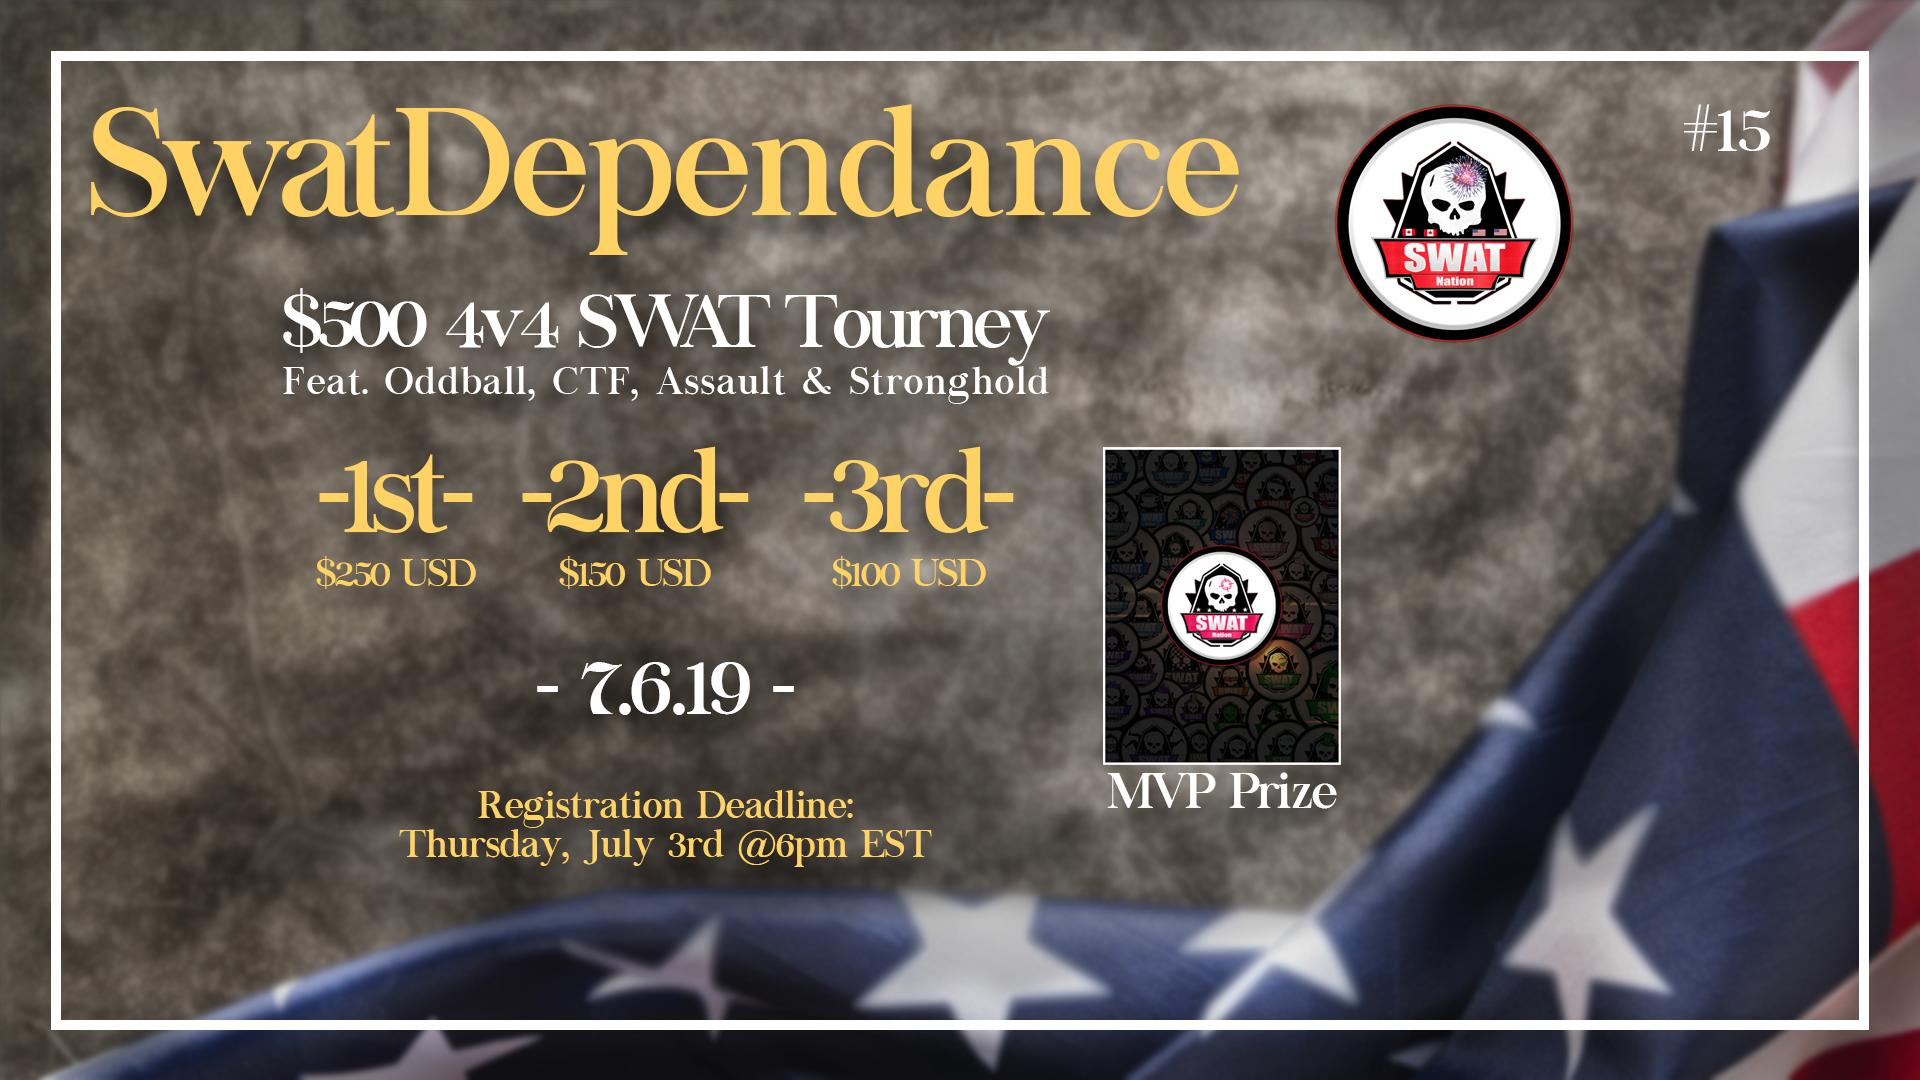 swatdependance+tourney.jpg